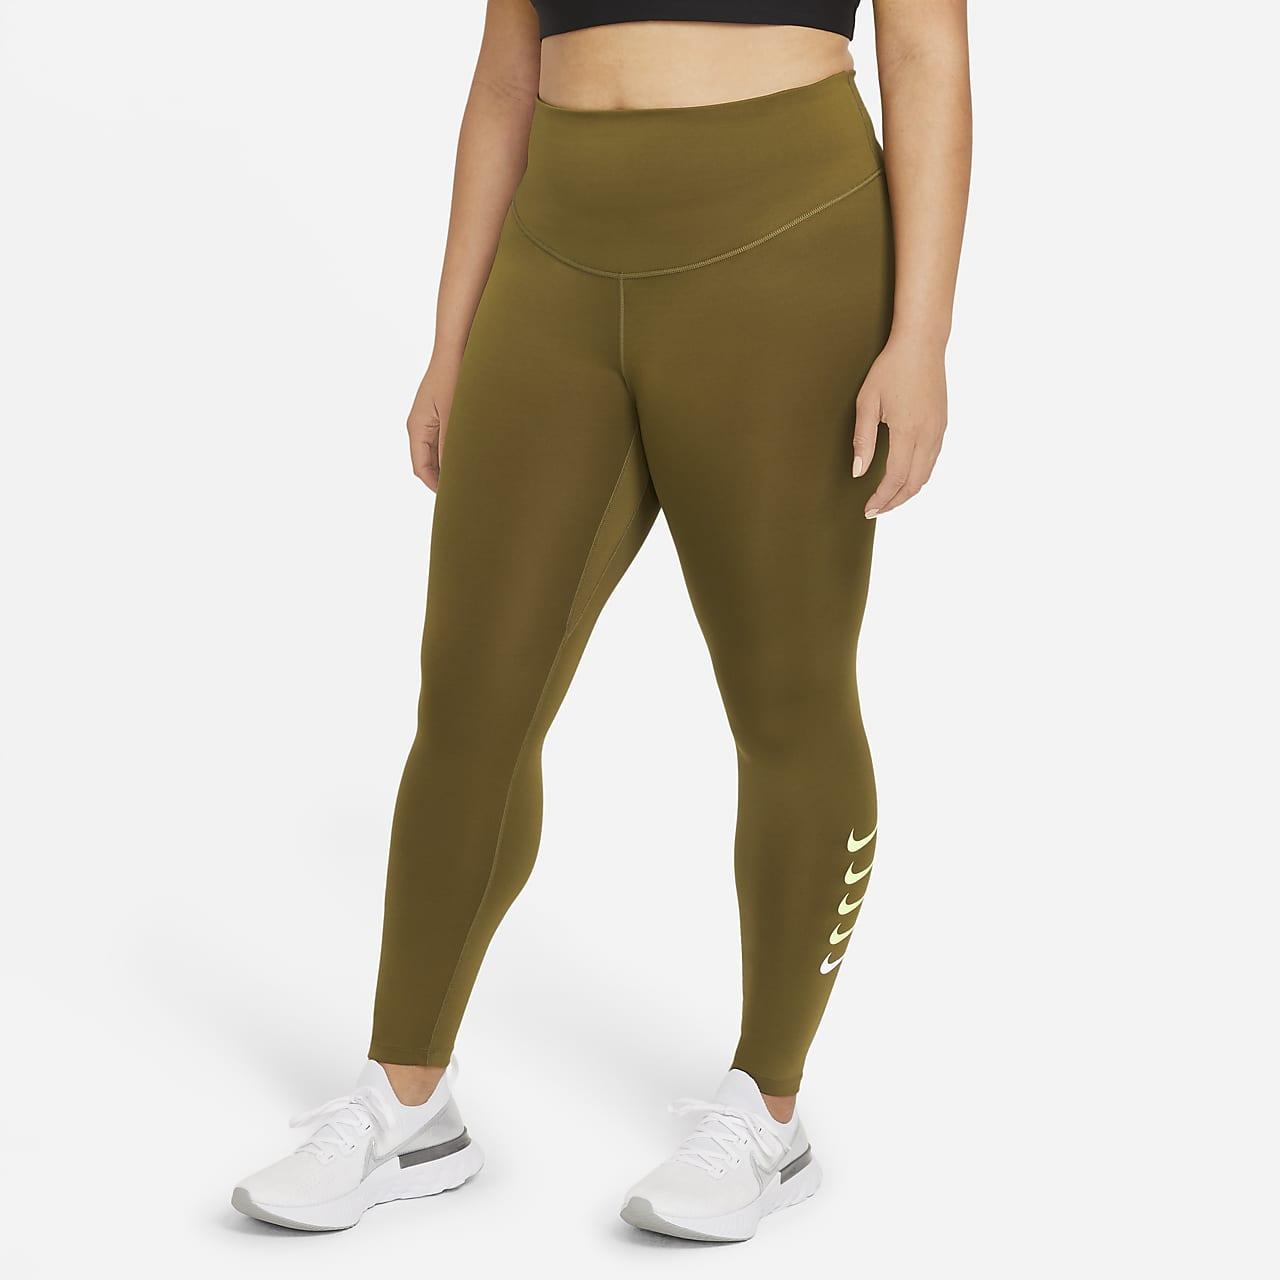 Nike Swoosh Run Women's 7/8 Running Leggings (Plus Size)